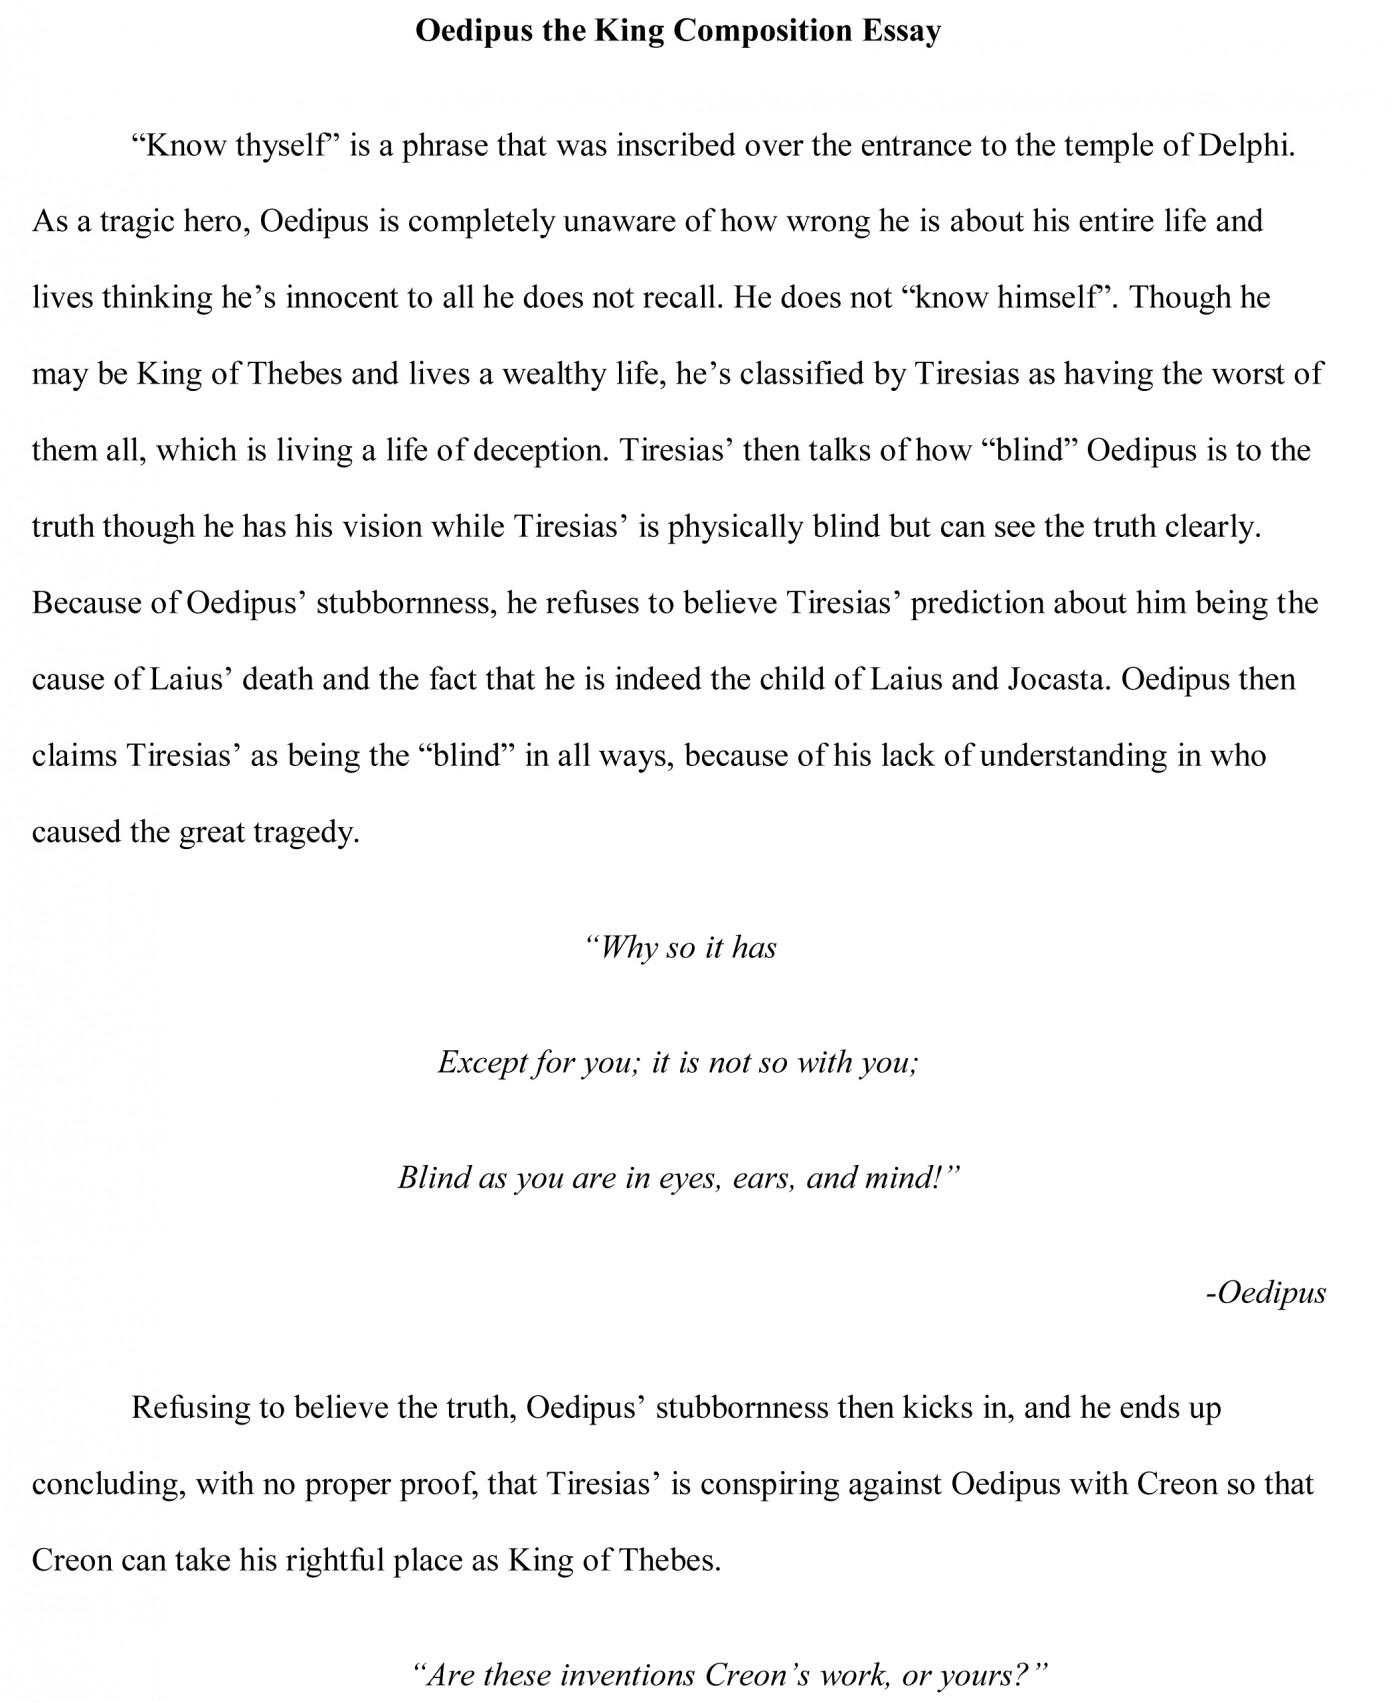 003 Essay Example Oedipus Free Sample Automatic Singular Grader 1400